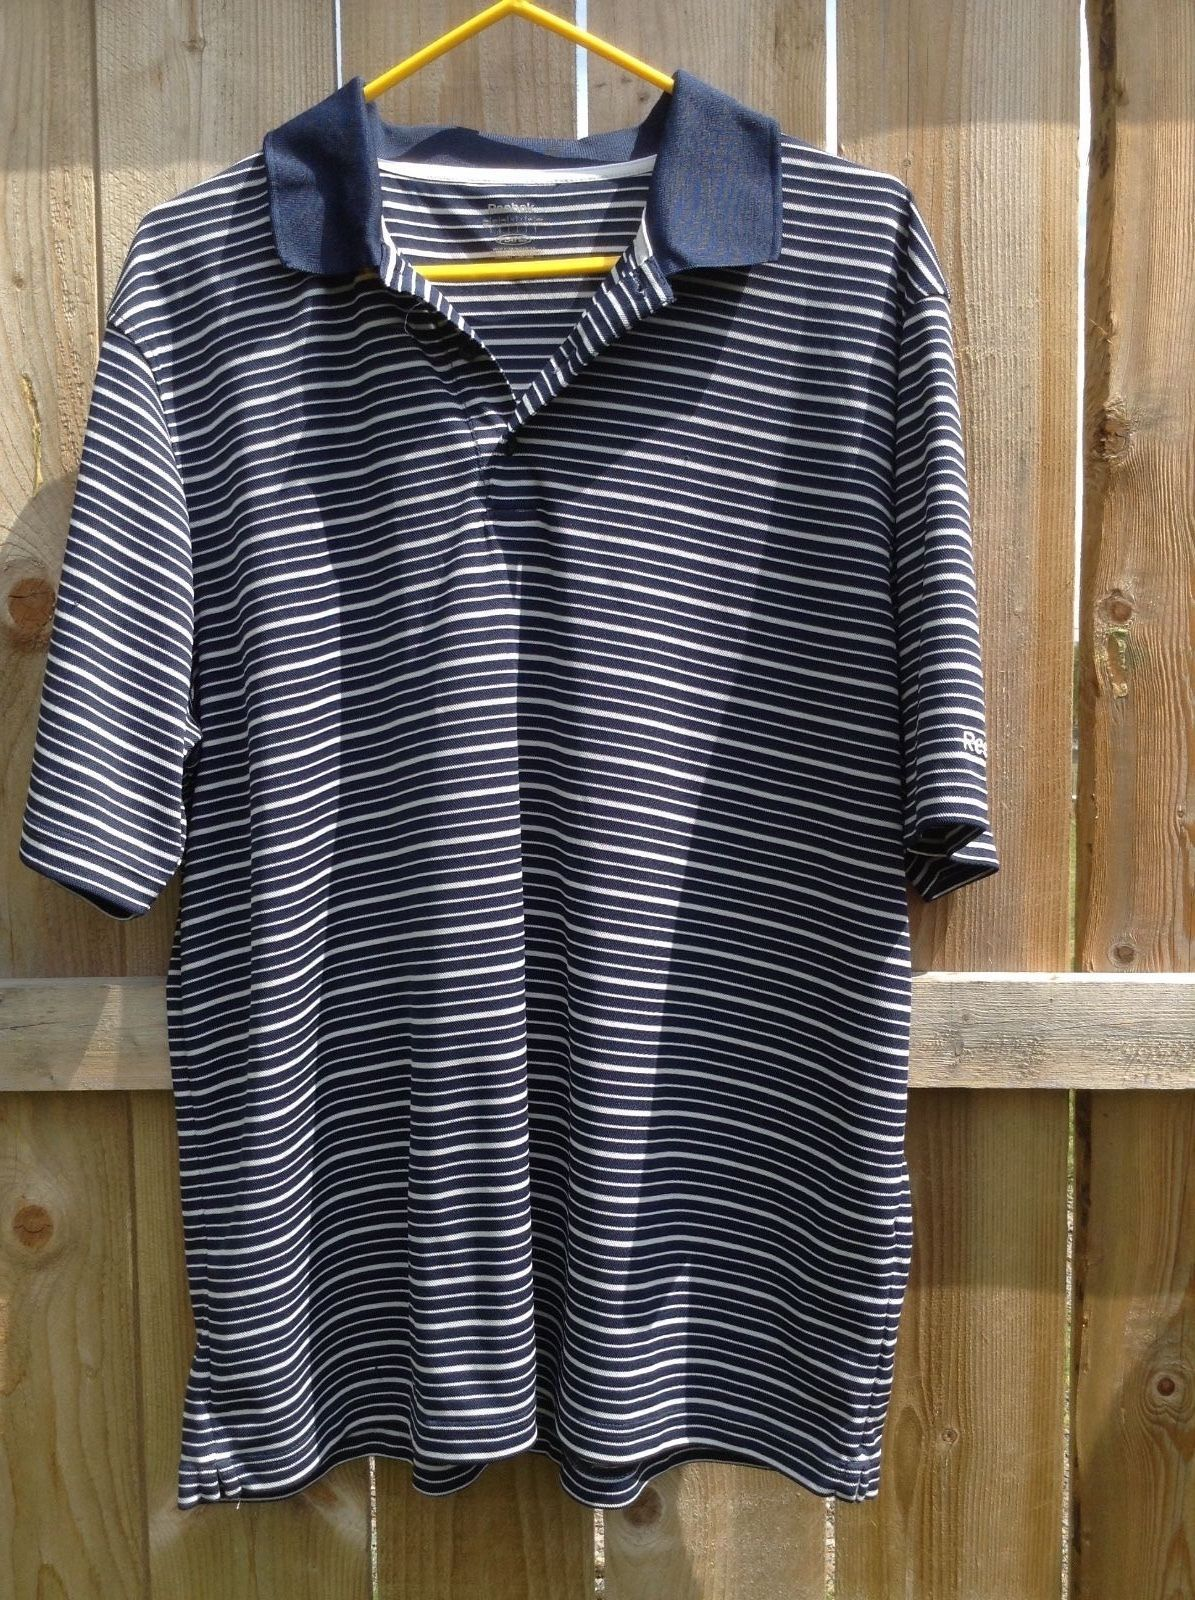 Mens XL Reebok blue and white stripe polo or golf short sleeve shirt